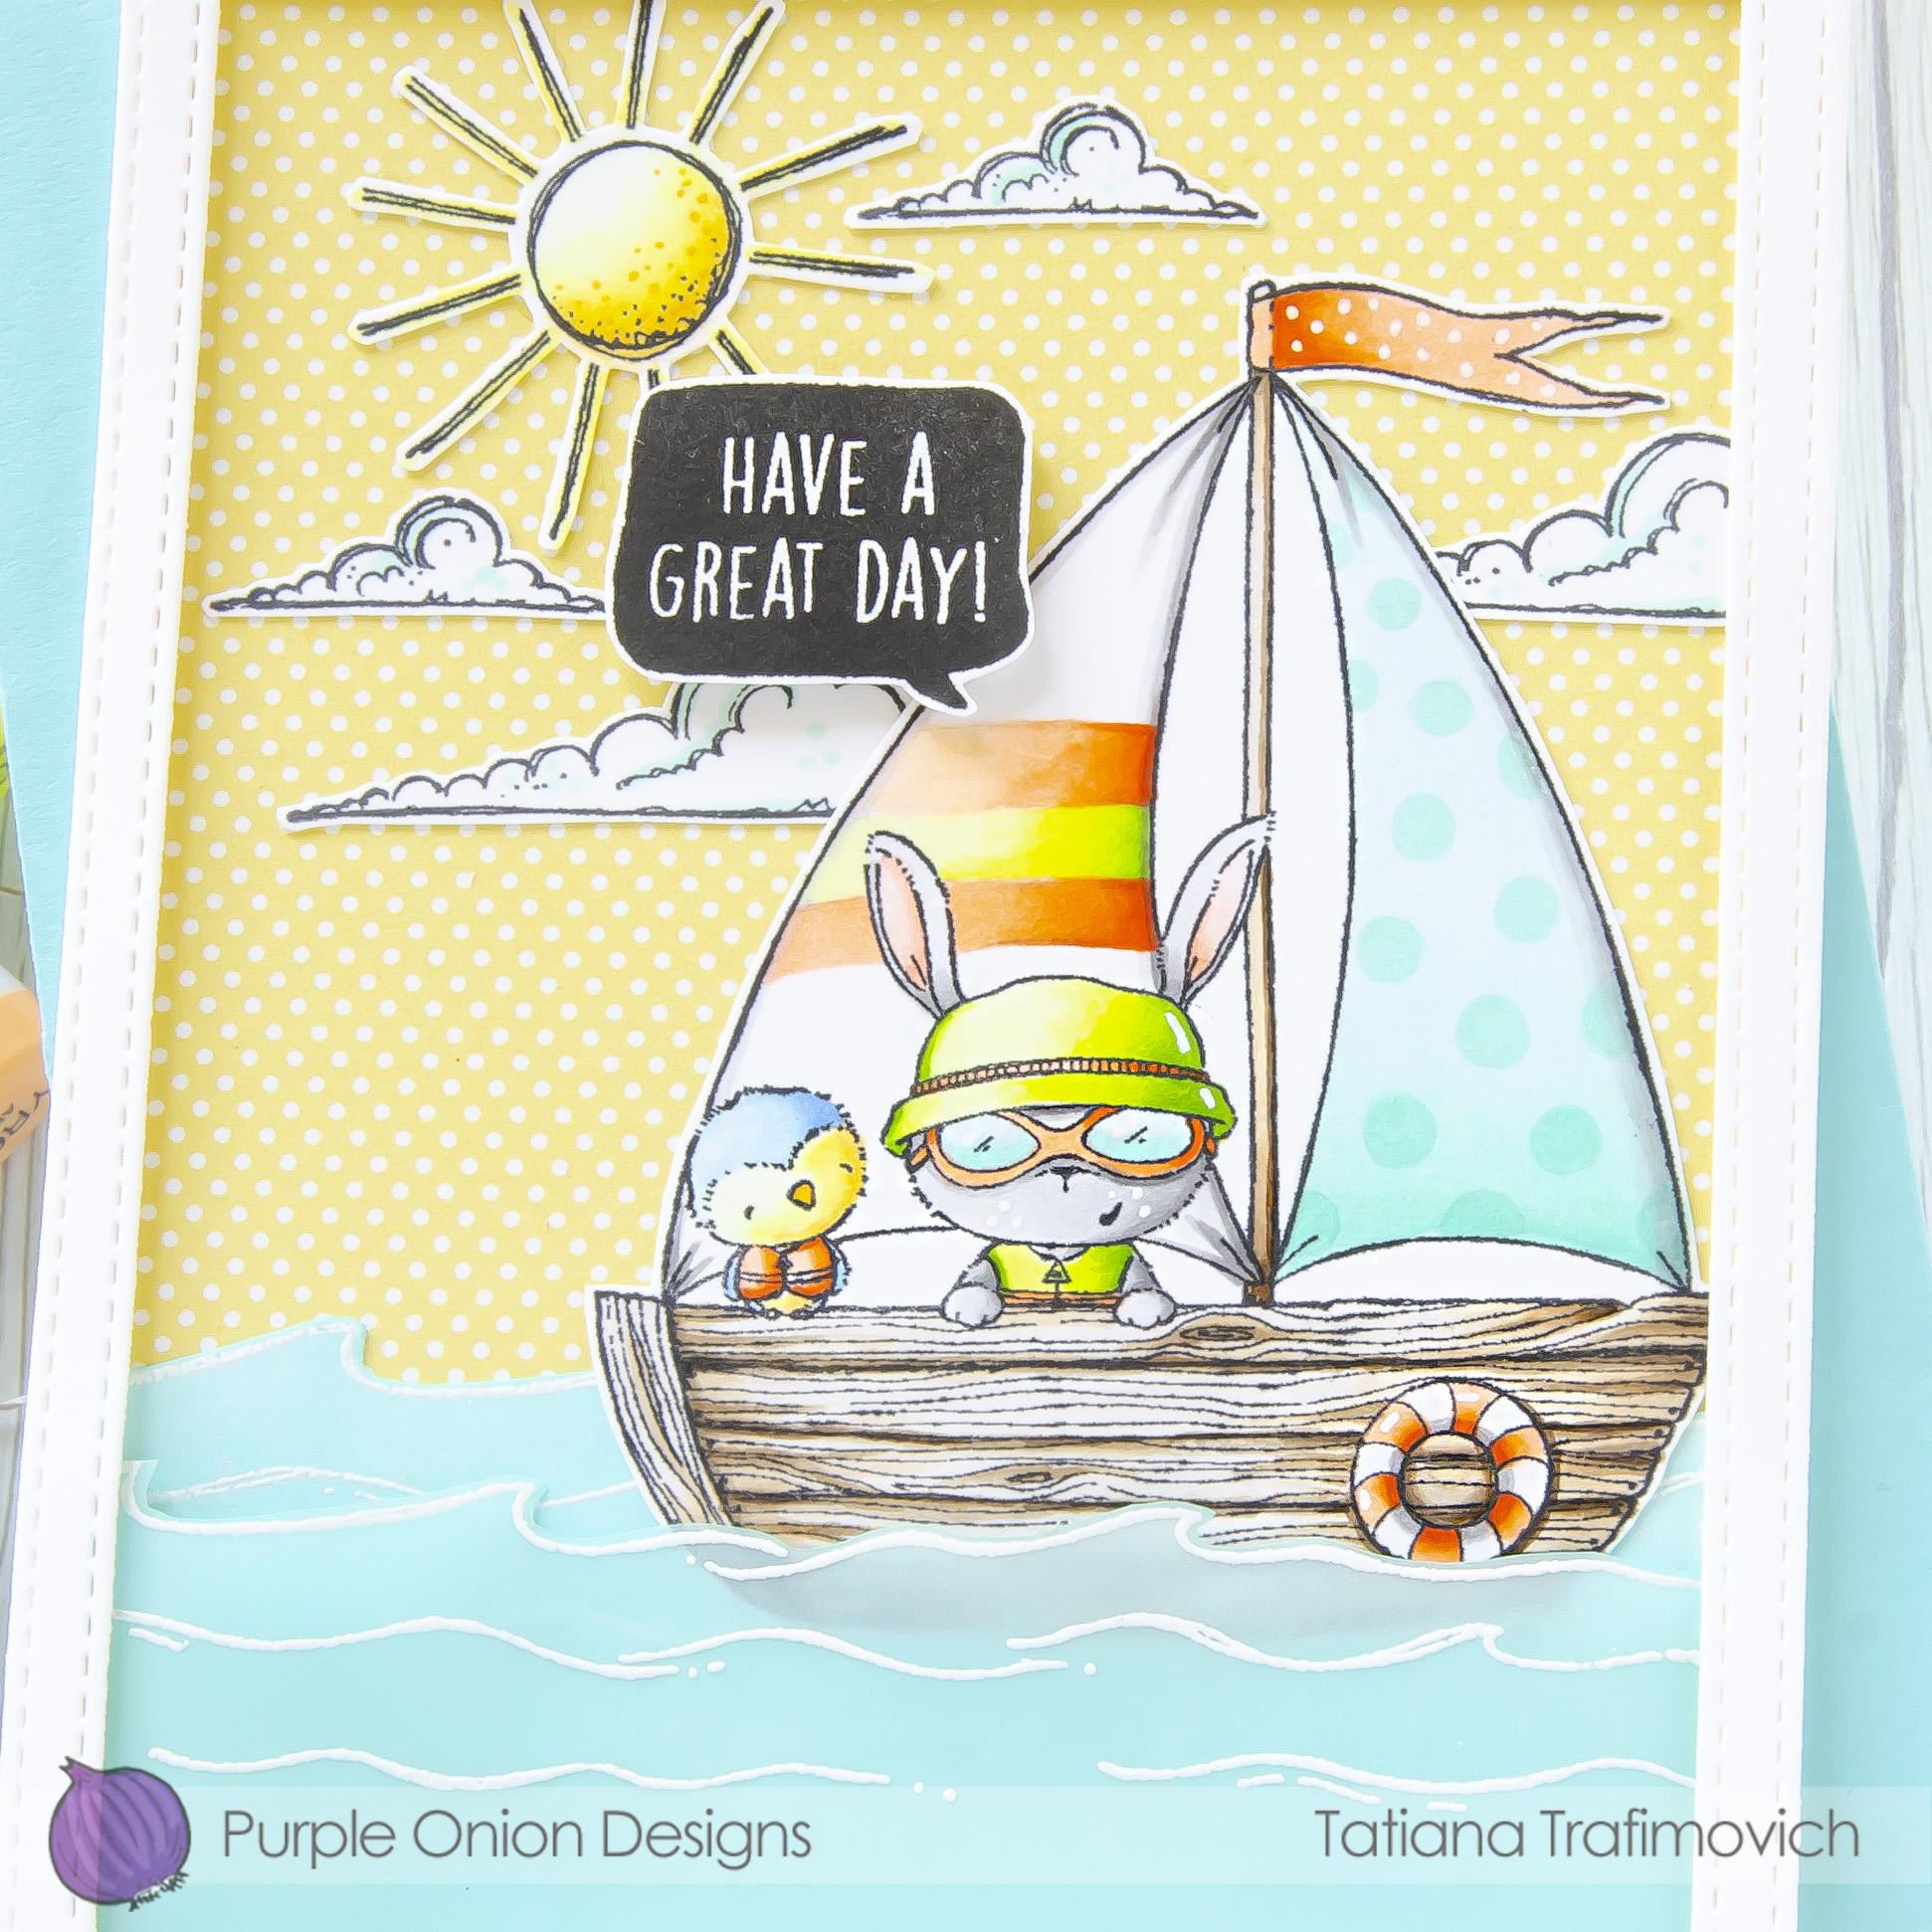 Have A Great Day! #handmade card by Tatiana Trafimovich #tatianacraftandart - stamps by Purple Onion Designs